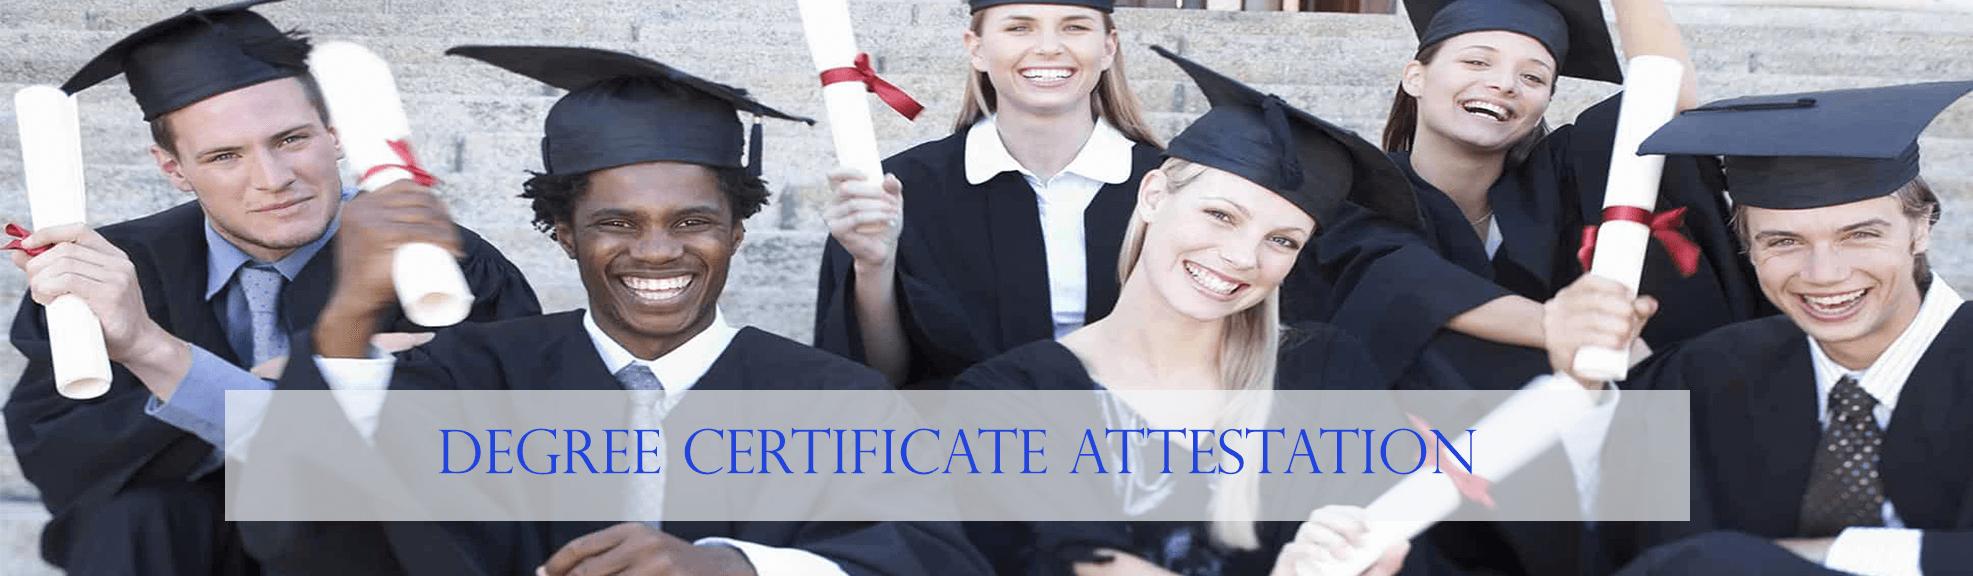 Degree Certificate Attestation in UAE